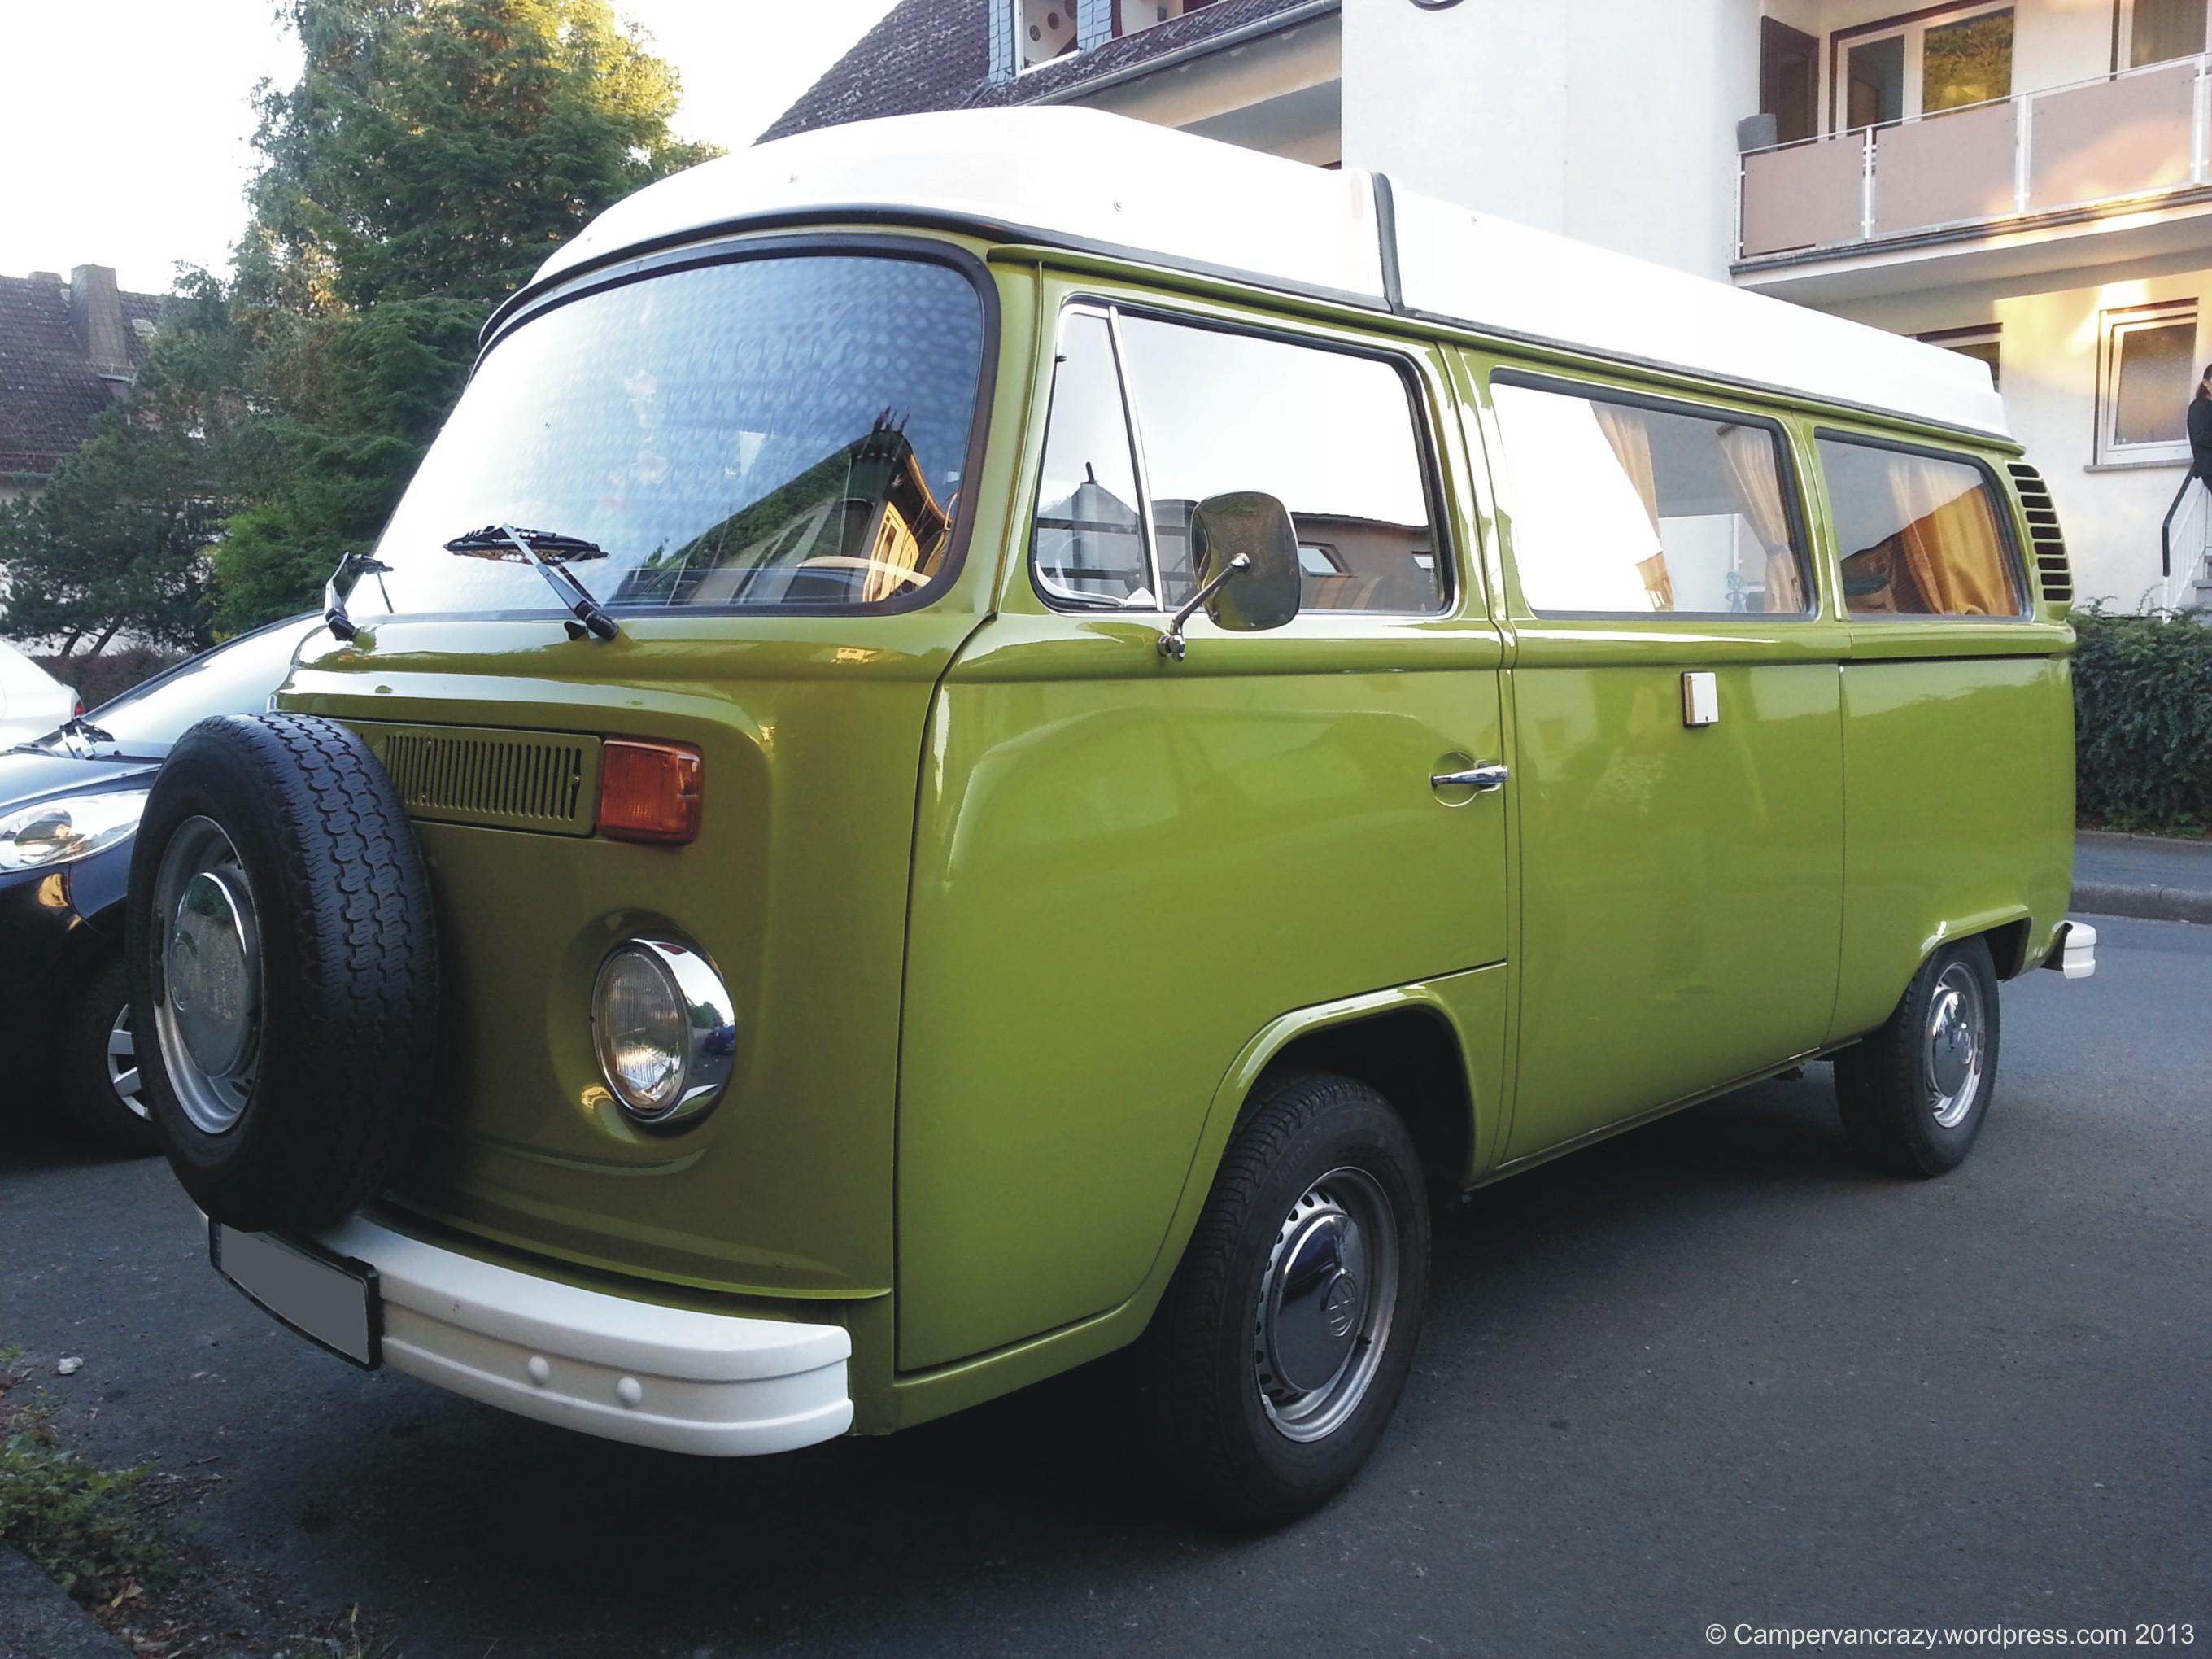 Craigslist Sheboygan Wi Cars